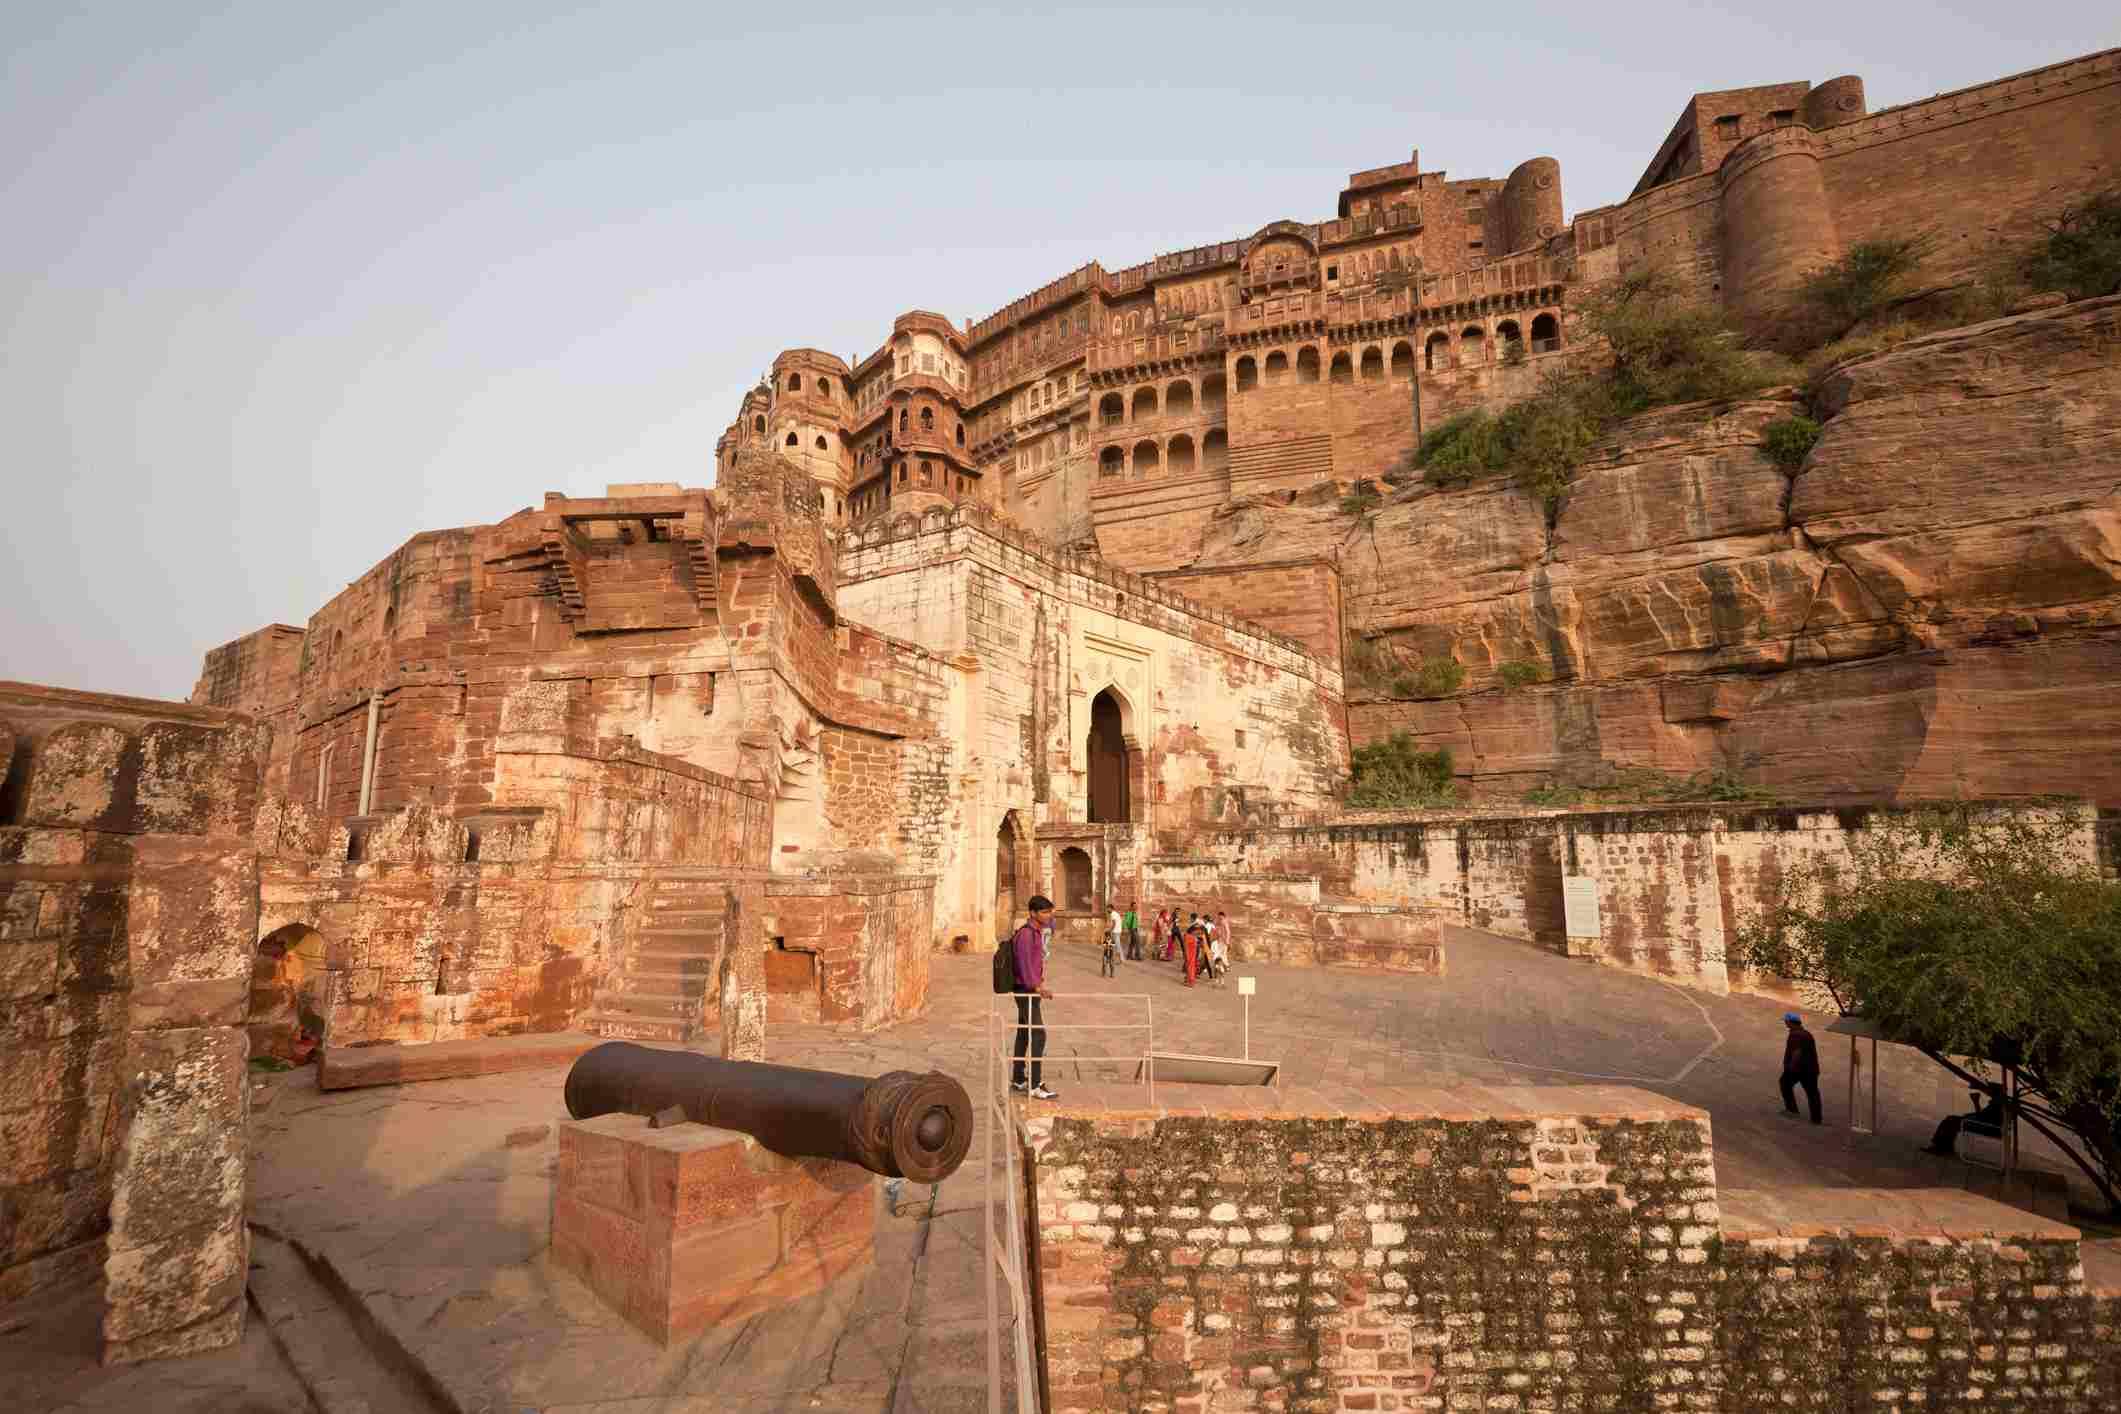 Fort Meherangarh, Jodhpur, Rajasthan